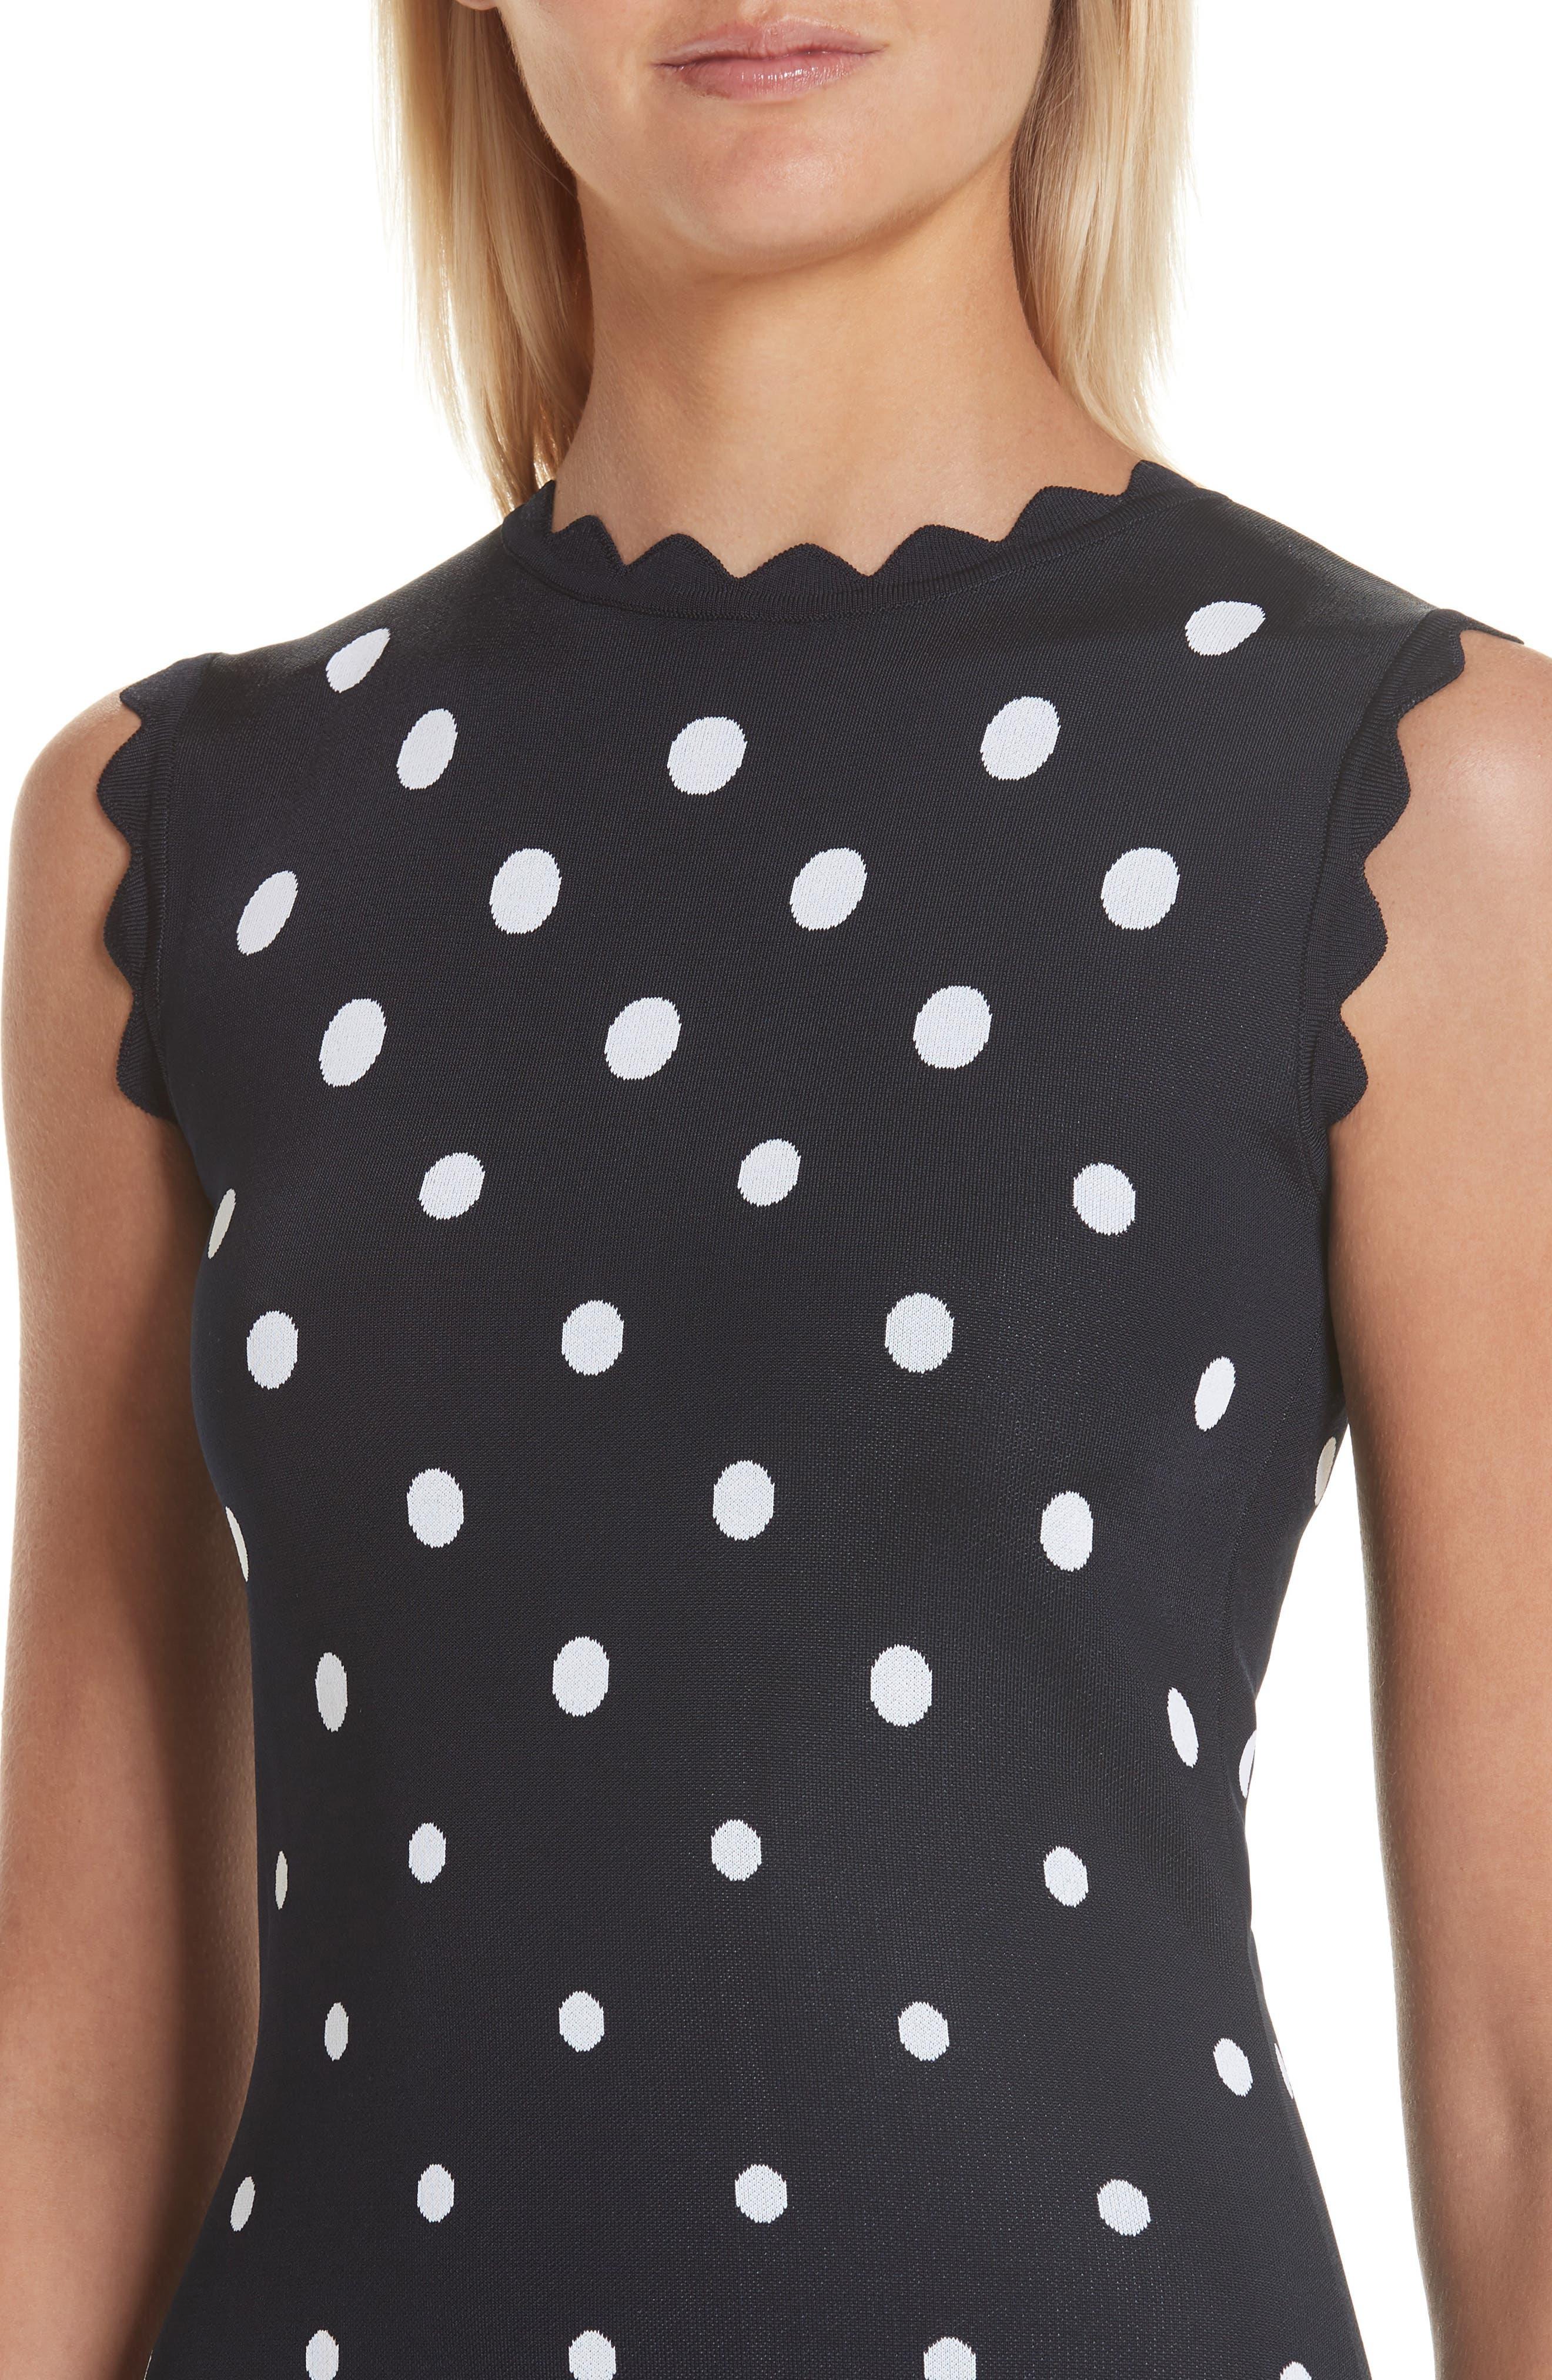 Scallop Edge Polka Dot A-Line Dress,                             Alternate thumbnail 4, color,                             NVW-NAVY/ WHITE